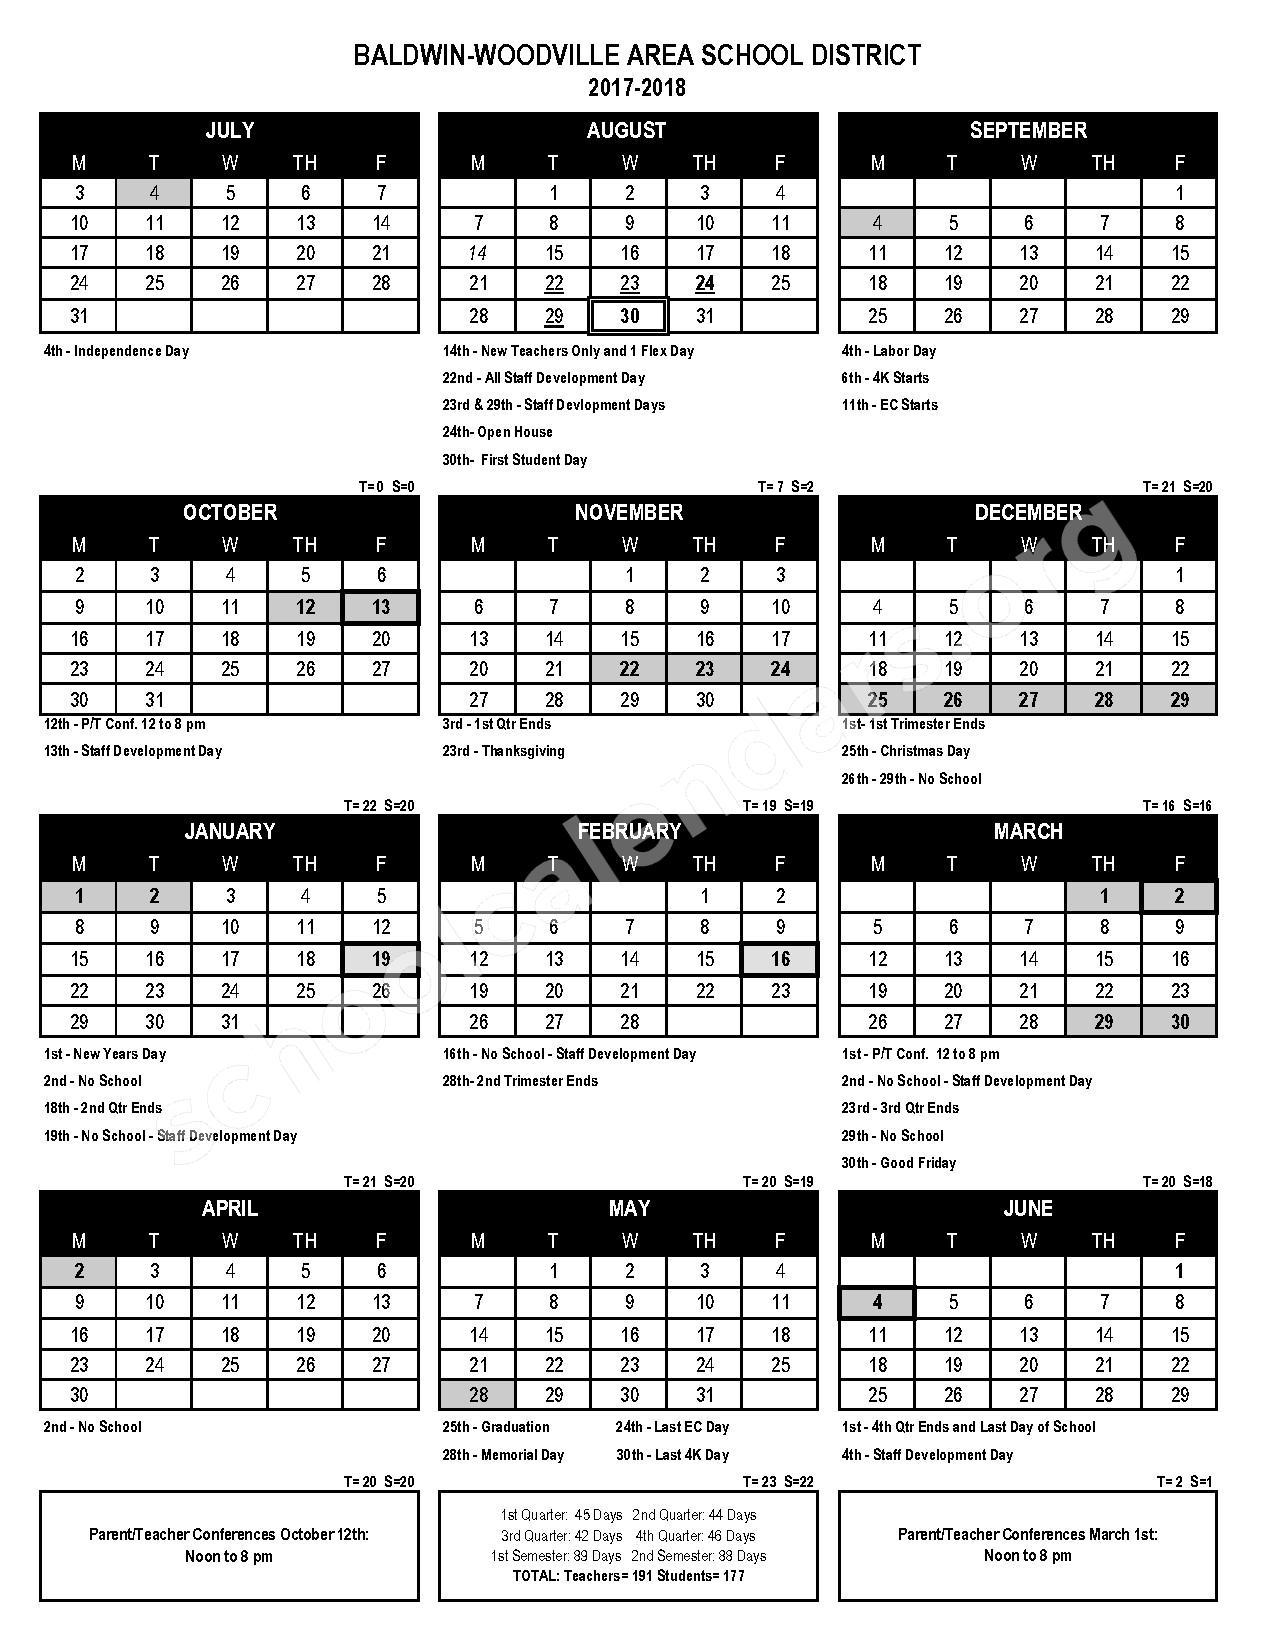 2017 - 2018 School Calendar – Baldwin-Woodville Area School District – page 1